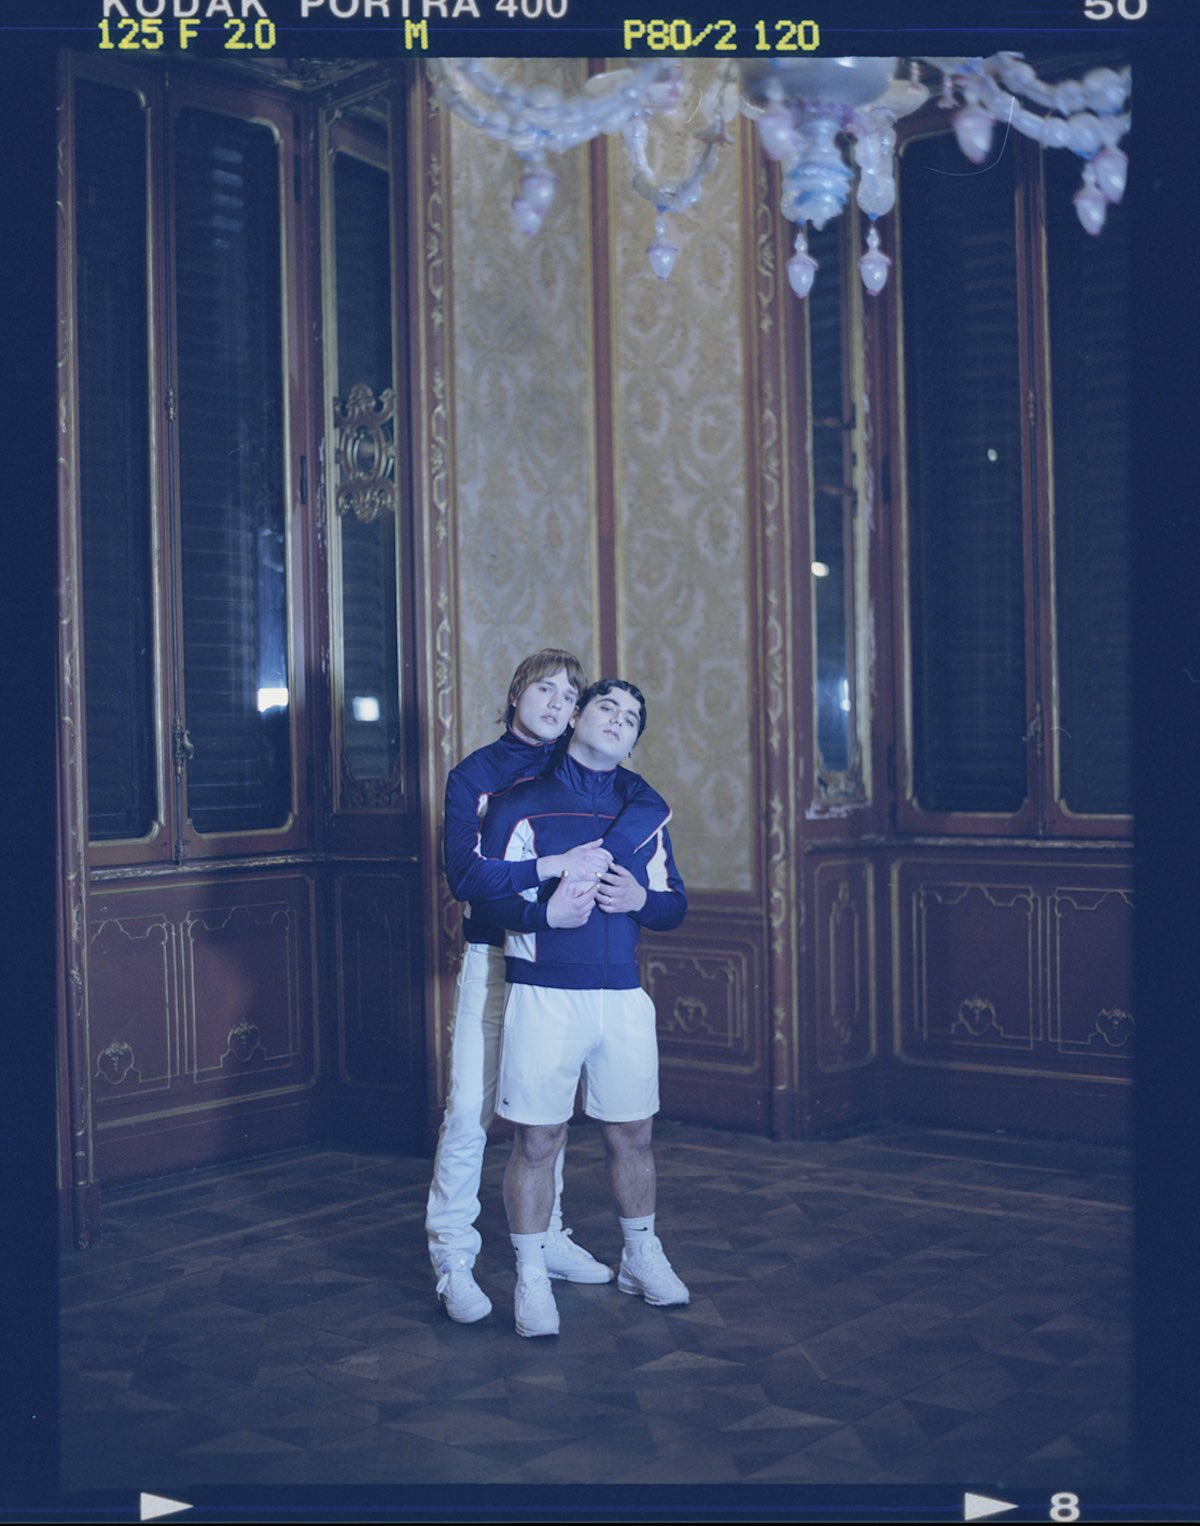 Sem & Stenn indossano le felpe Levi's Sportswear e 501 Jeans bianco.